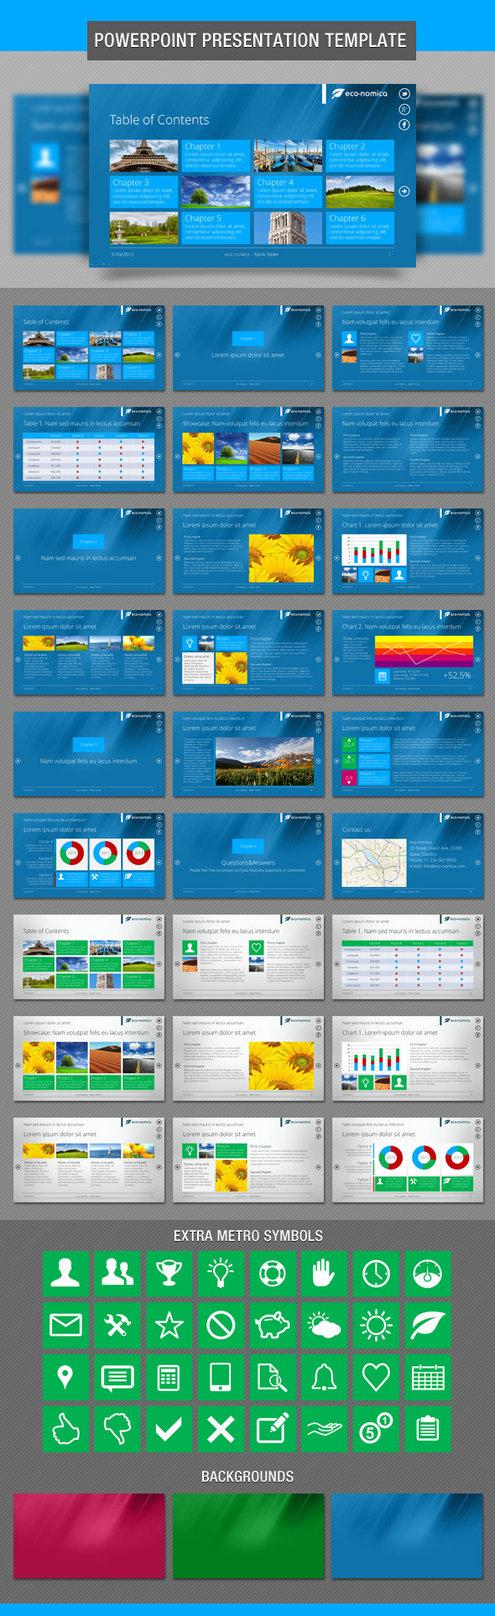 Metro style powerpoint presentation template apresentaes ppt metro style powerpoint presentation template toneelgroepblik Image collections